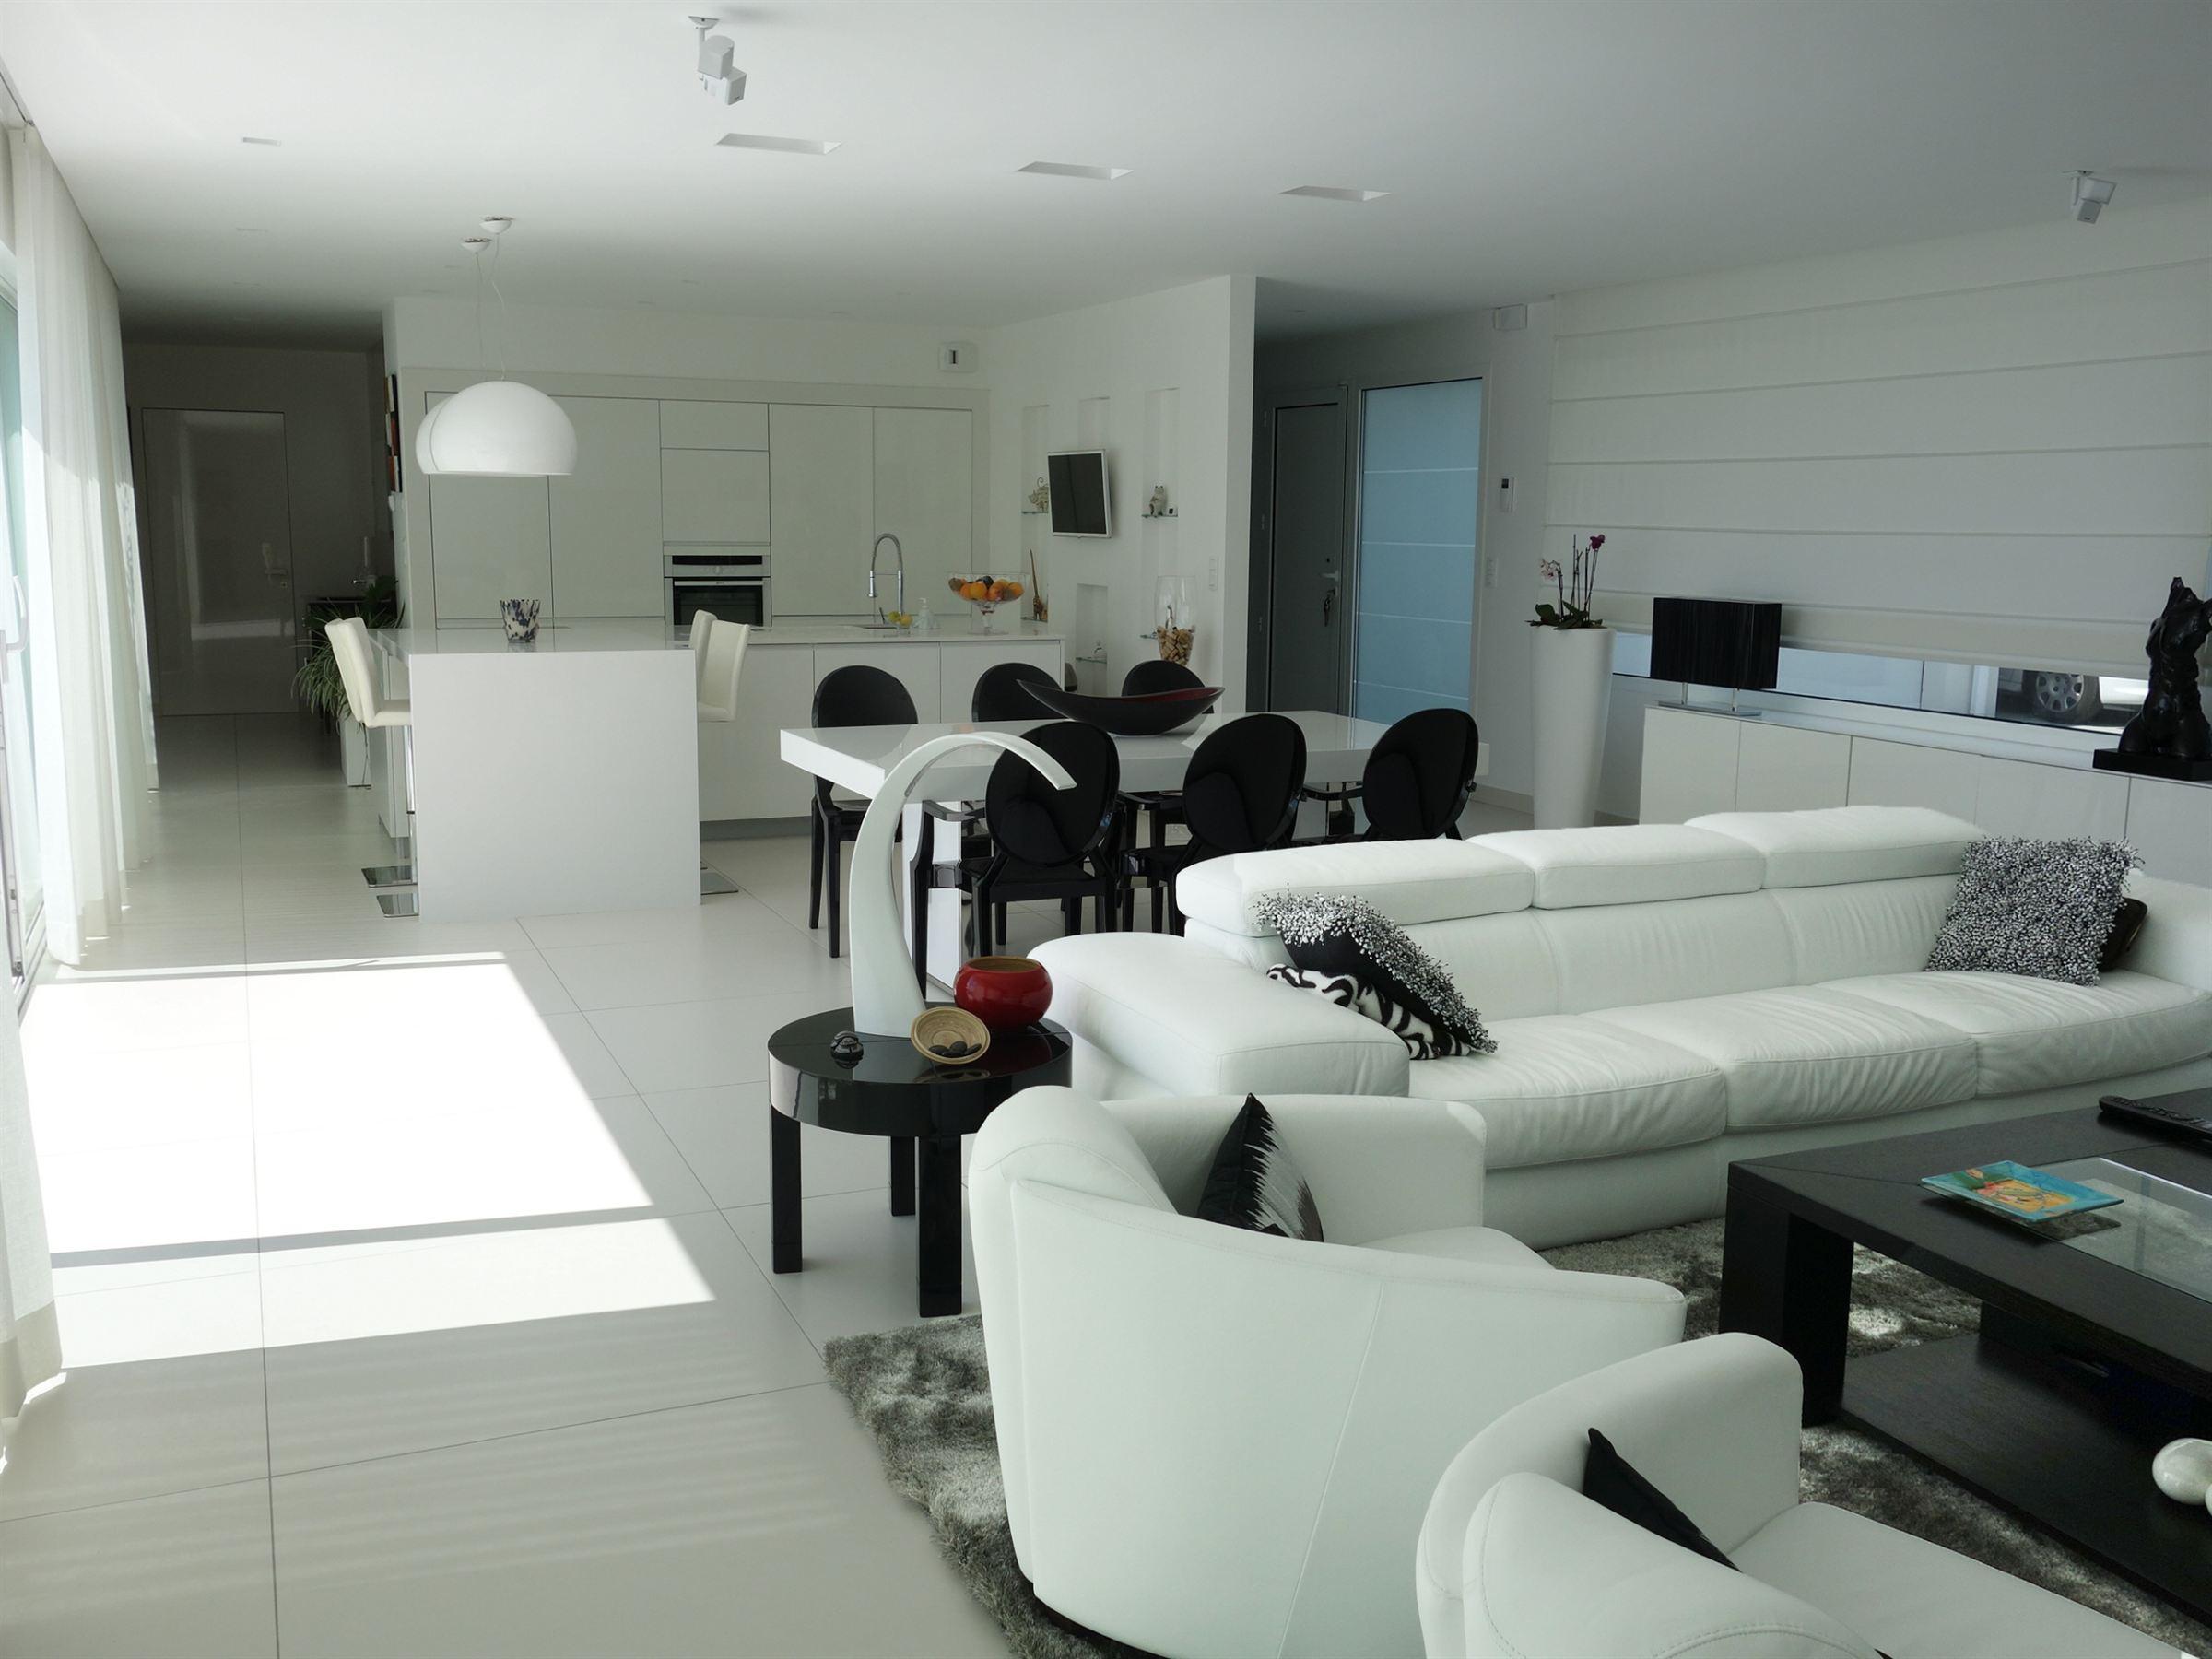 sales property at Mérignies, Luxurious 224sqm contemporary villa, 3 bedrooms.